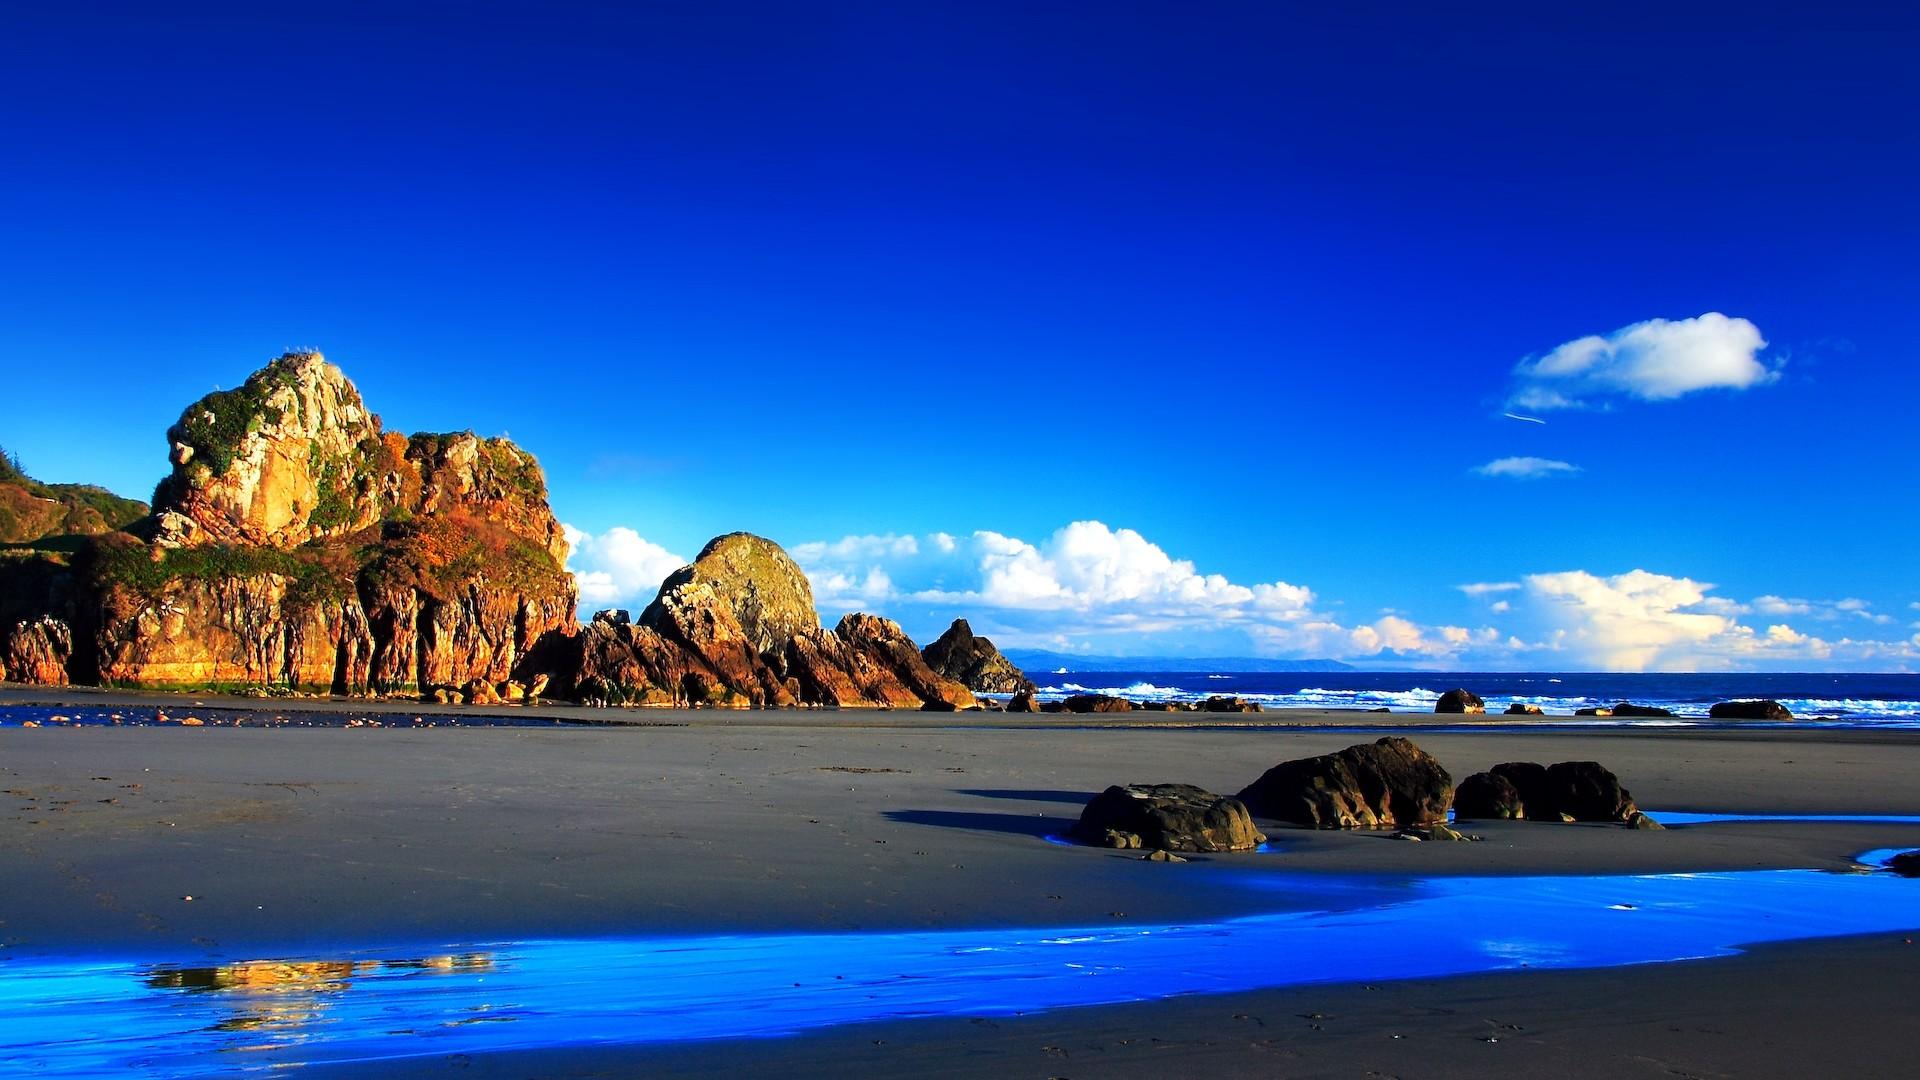 Res: 1920x1080, Windows Vista Beach Wallpaper HD Wallpapers At For